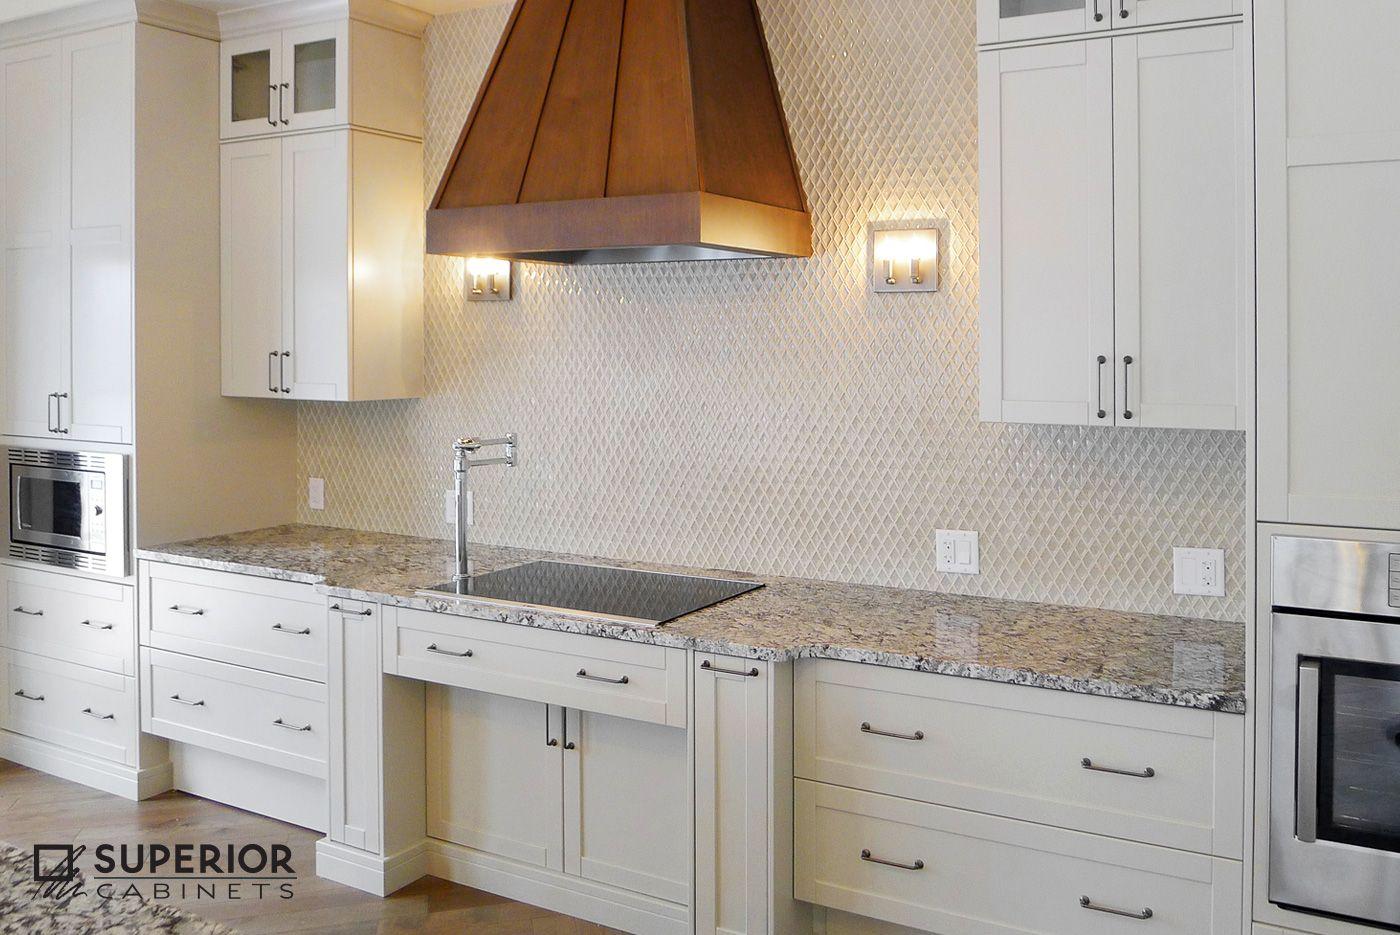 Design By: Shanna McDonald Kitchen And Bath Designer, Superior Cabinets  Saskatoon; Builder: